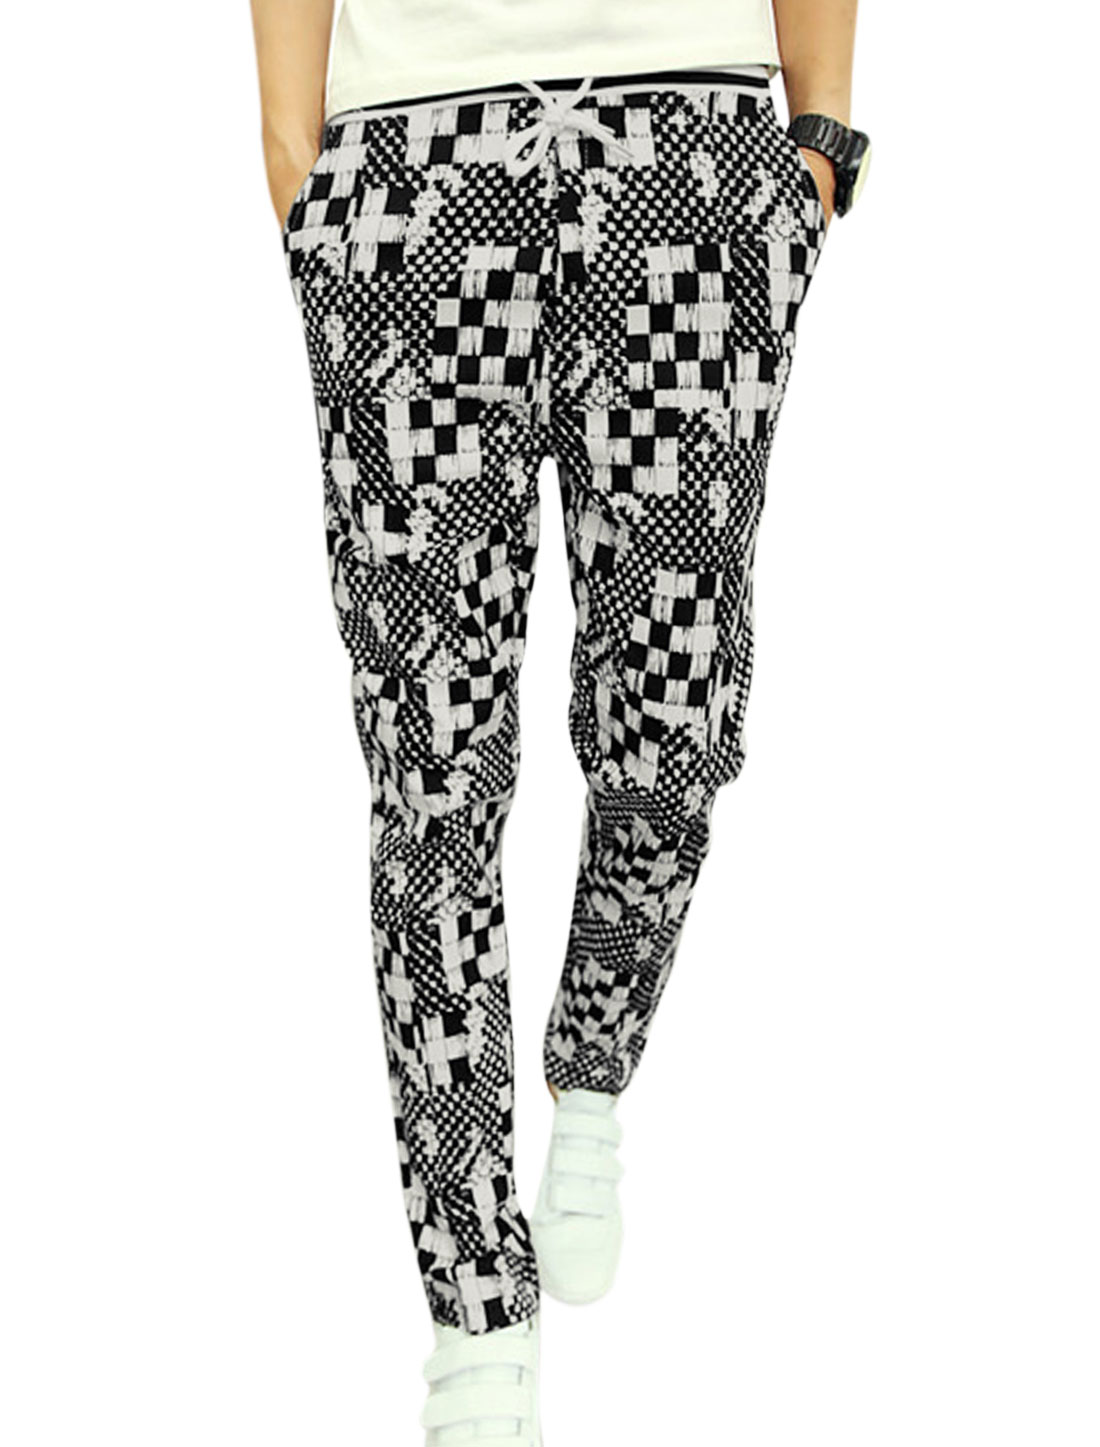 Men Elastic Wasit Skinny Check Pattern Plaids Chic Pants Black White W28